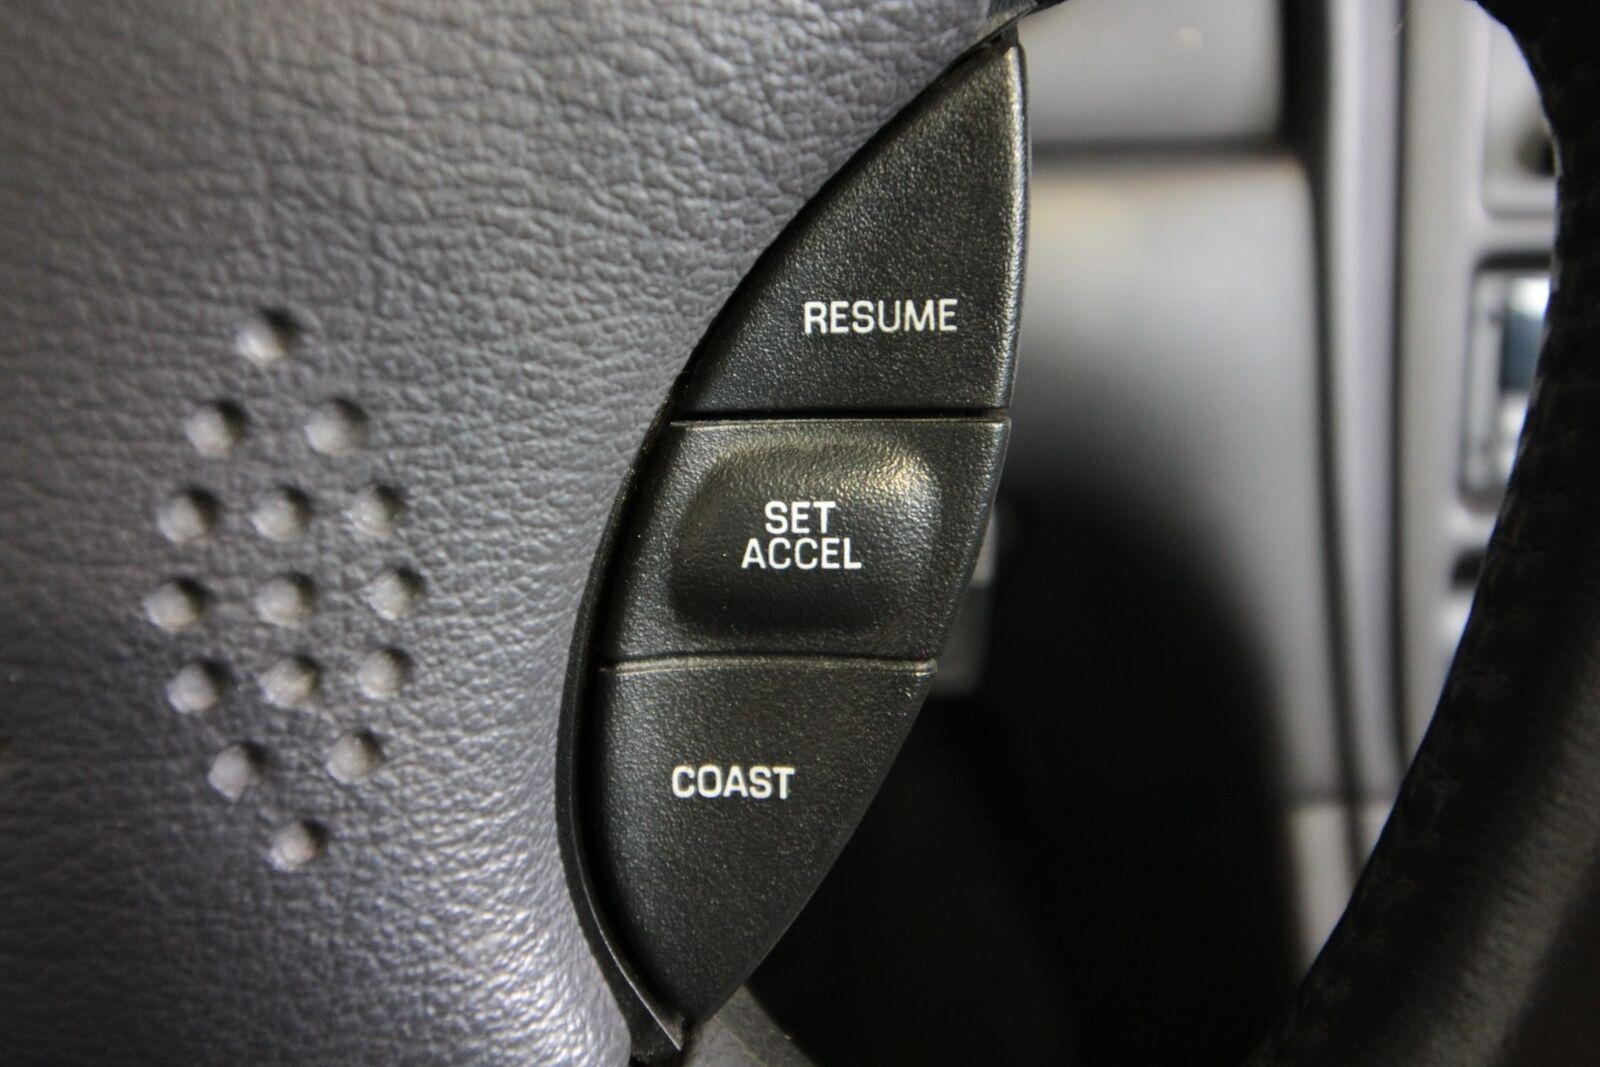 Ford Mustang Cobra SVT Coupé